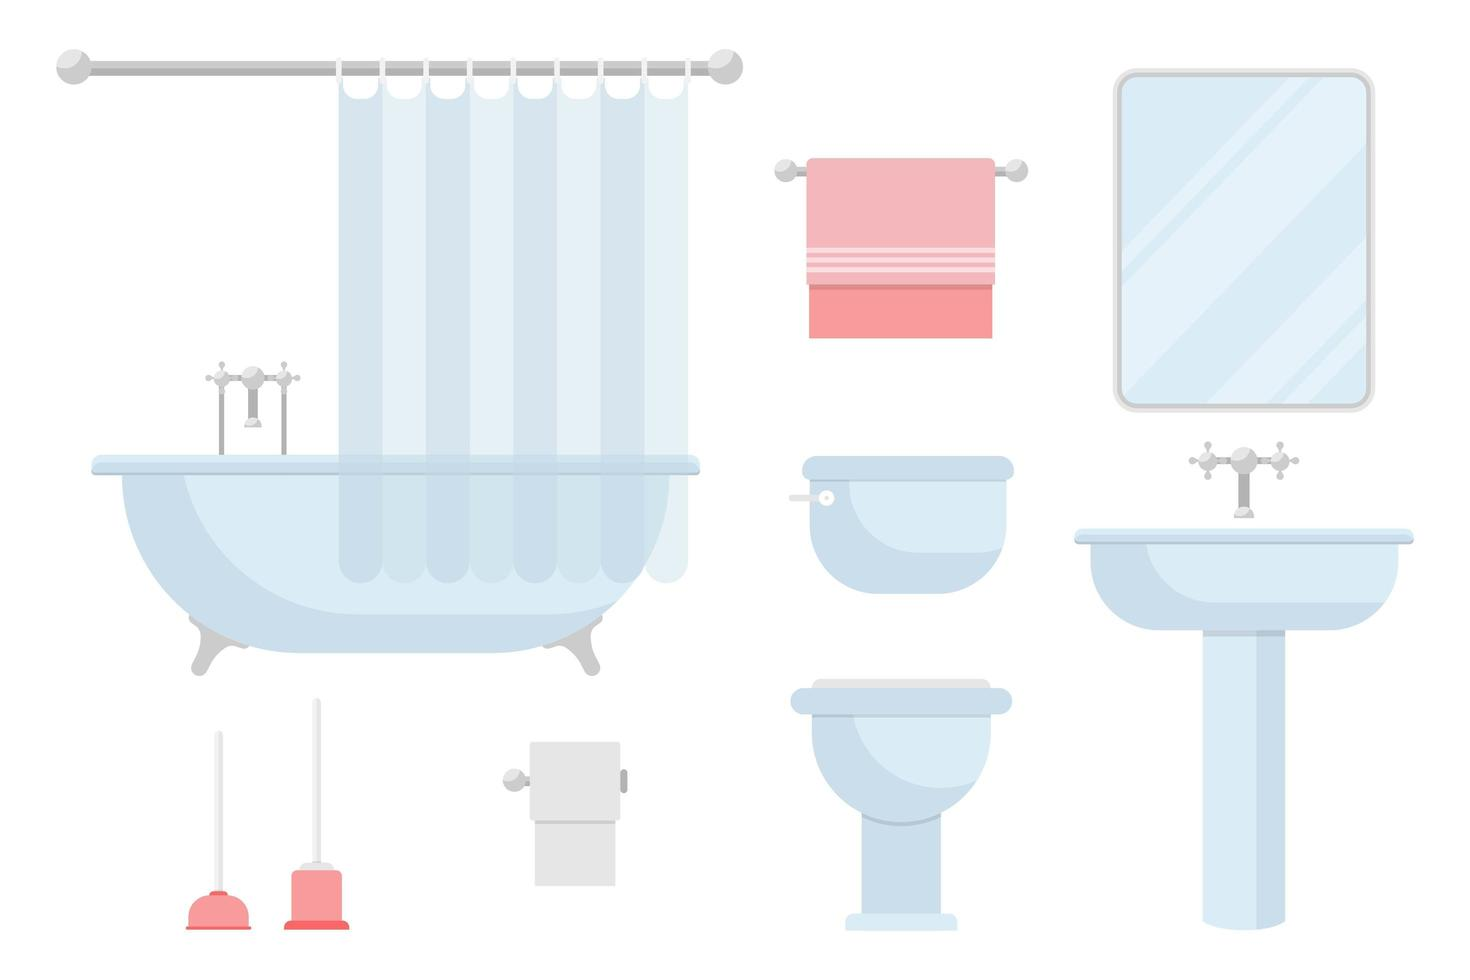 badkamer armatuur en uitrusting set vector